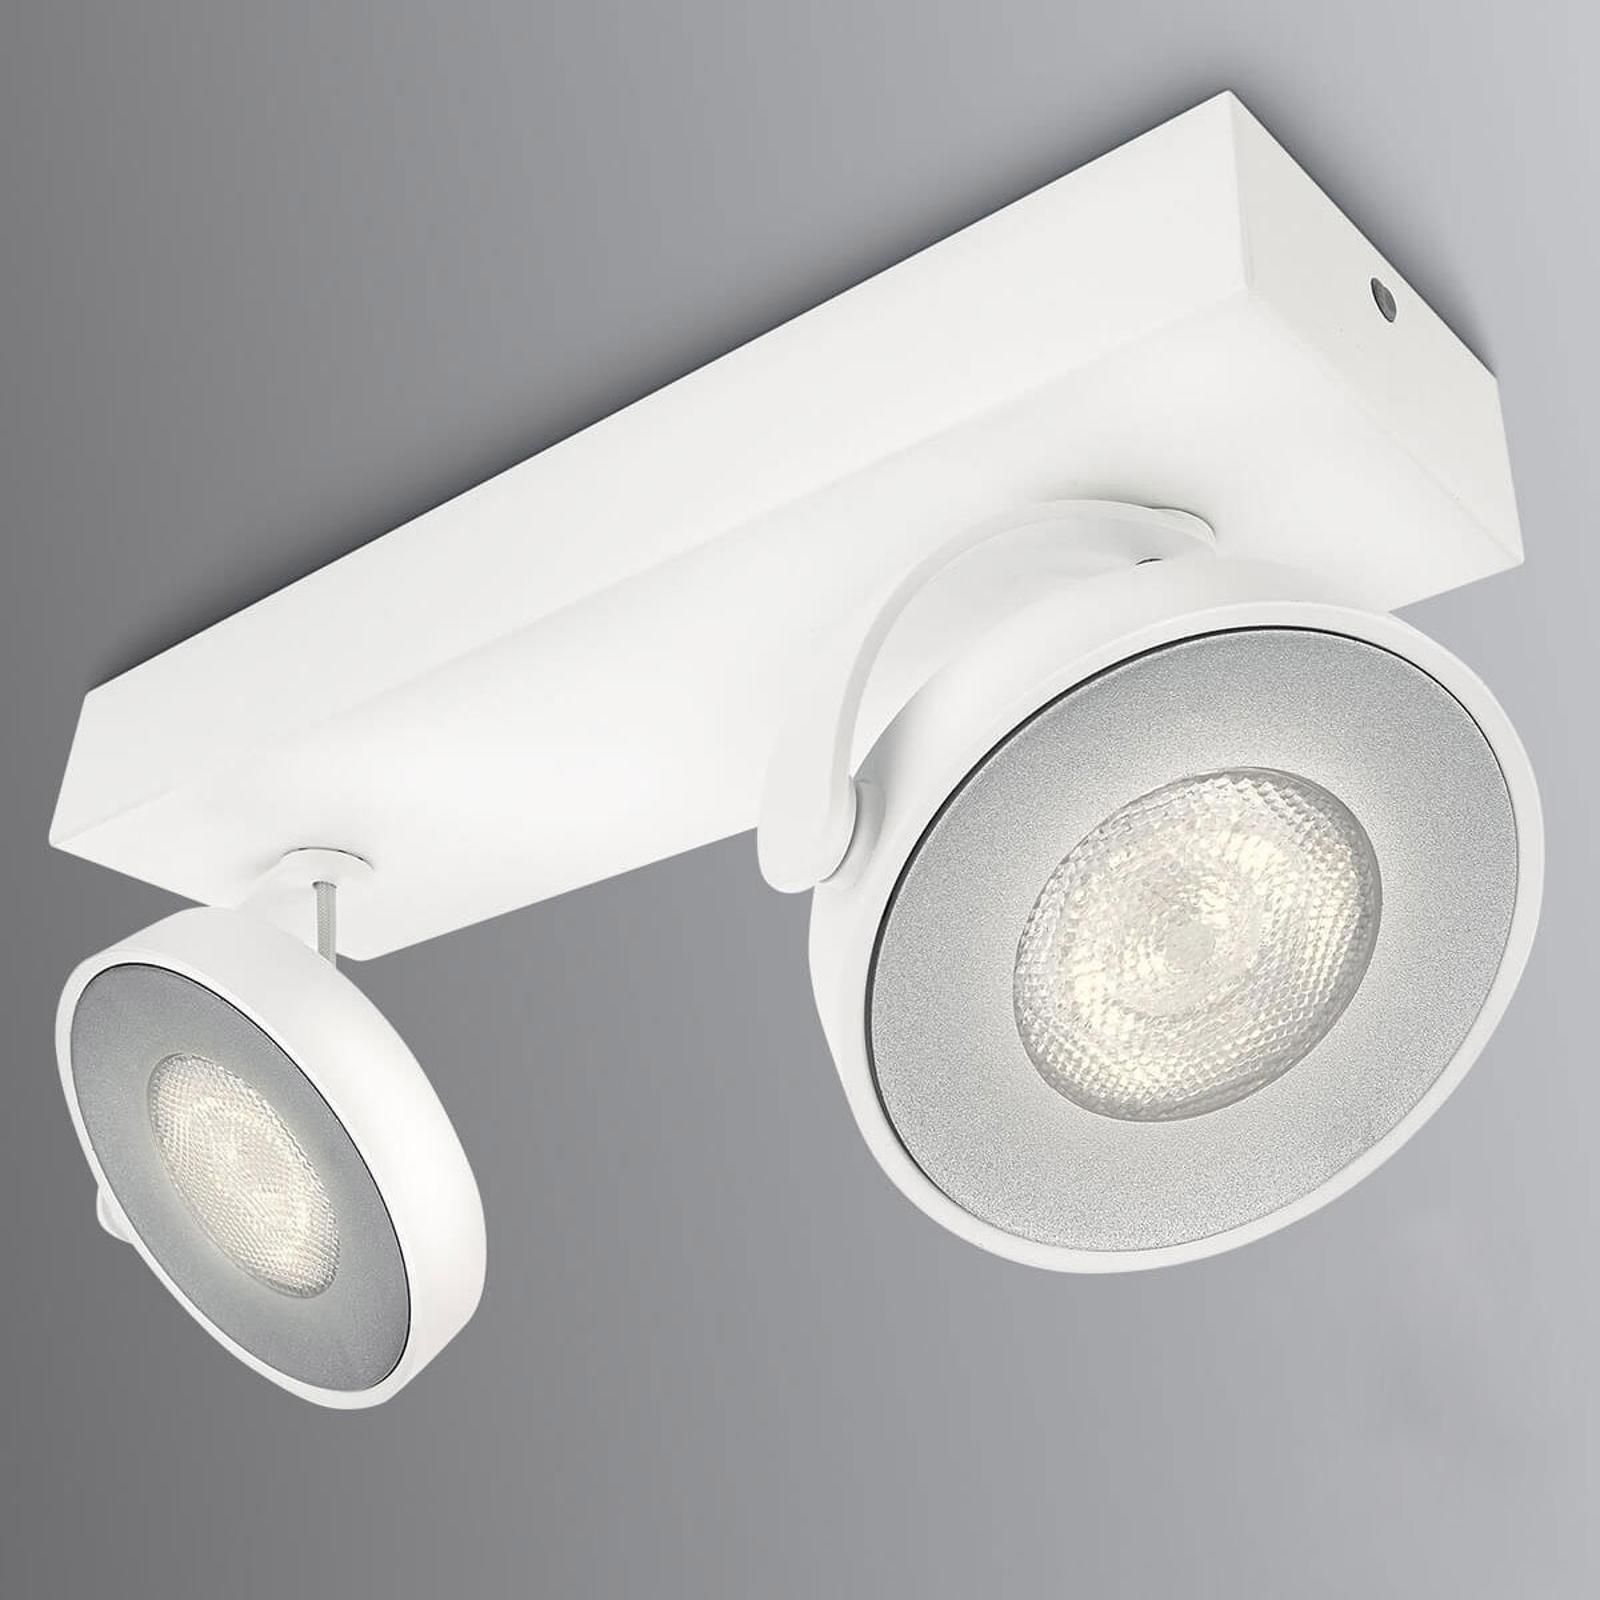 met 2 lampen LED spot Clockwork m. warmglow effect